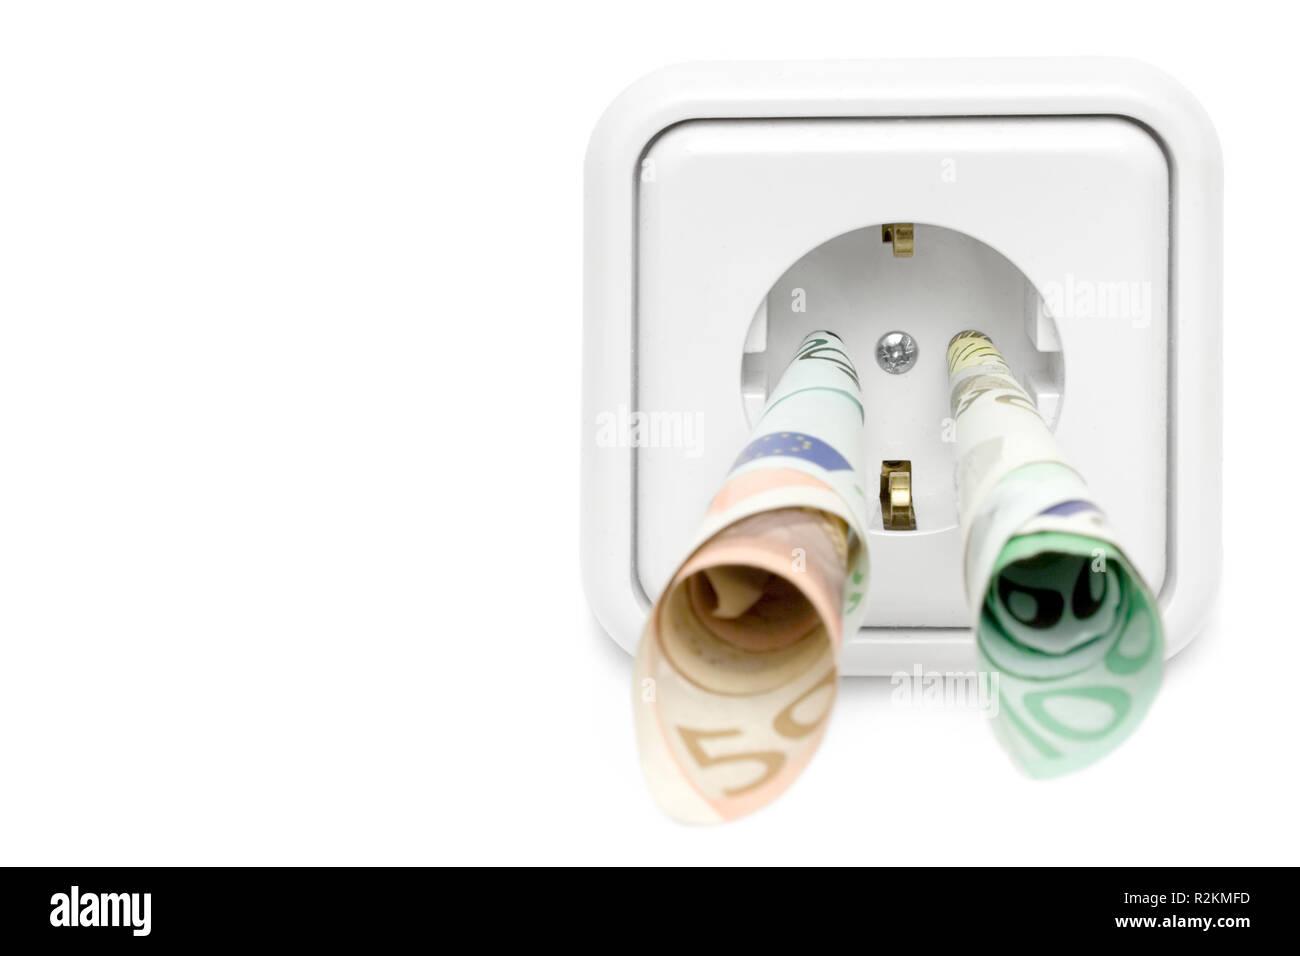 energy prices - Stock Image